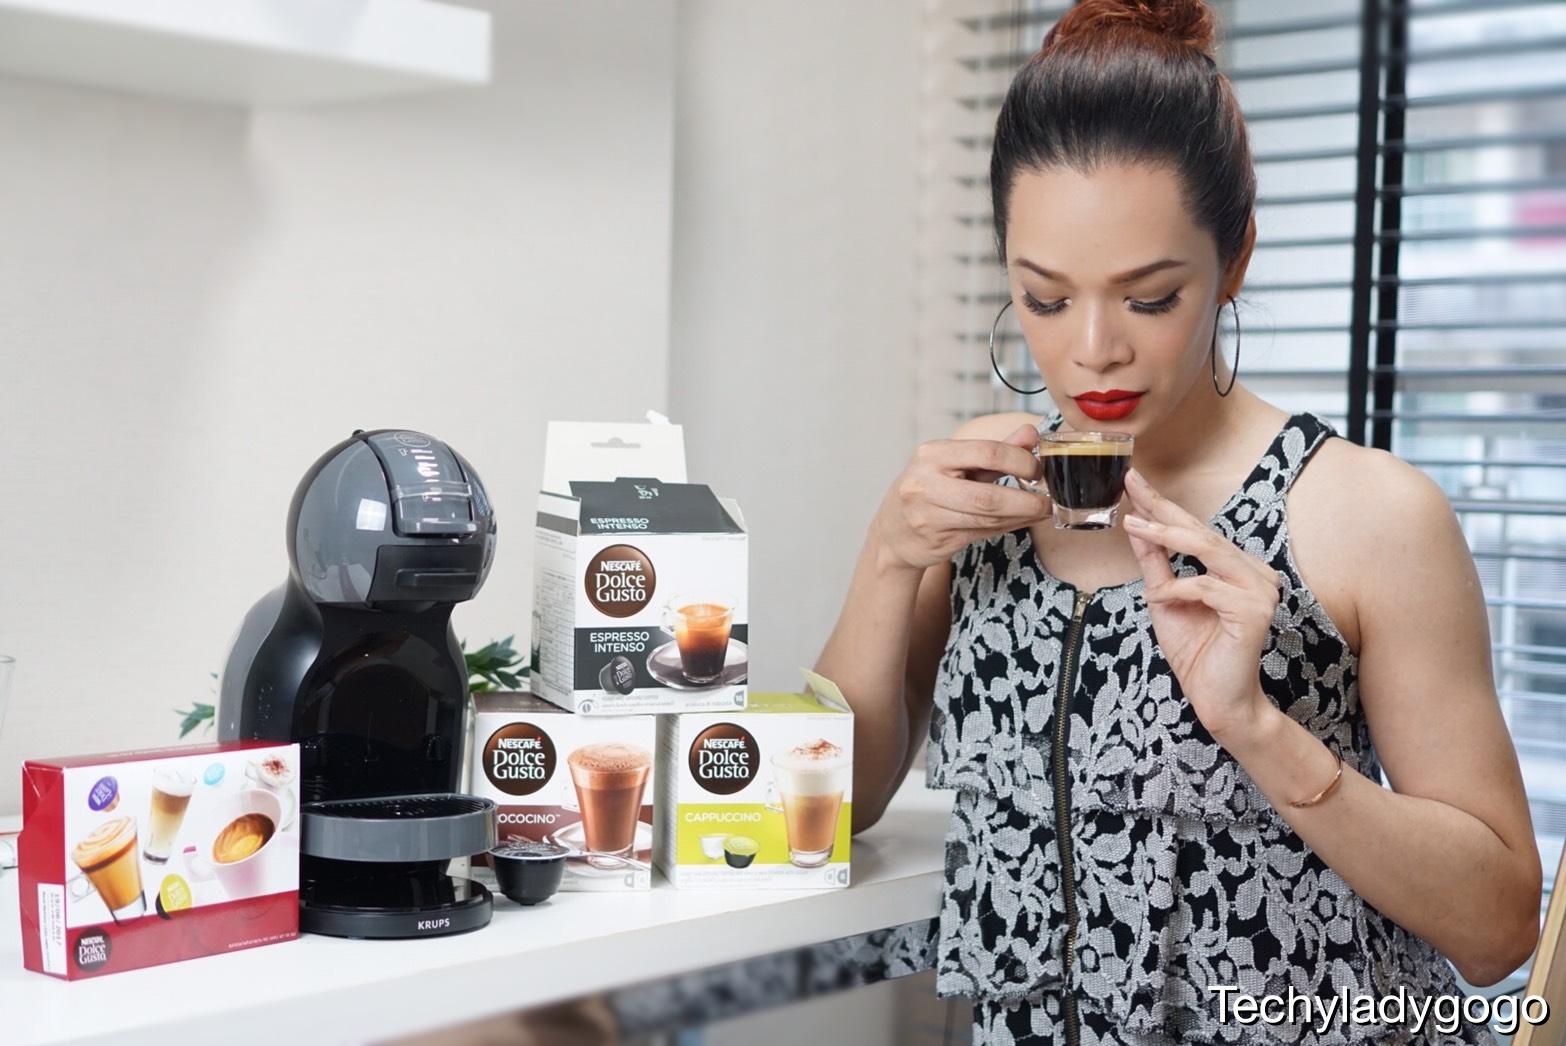 techyladygogo ดื่มกาแฟ espresso intense จากเครื่องชงกาแฟแคปซูลอัตโนมัติ Nescafe Dolce Gusto